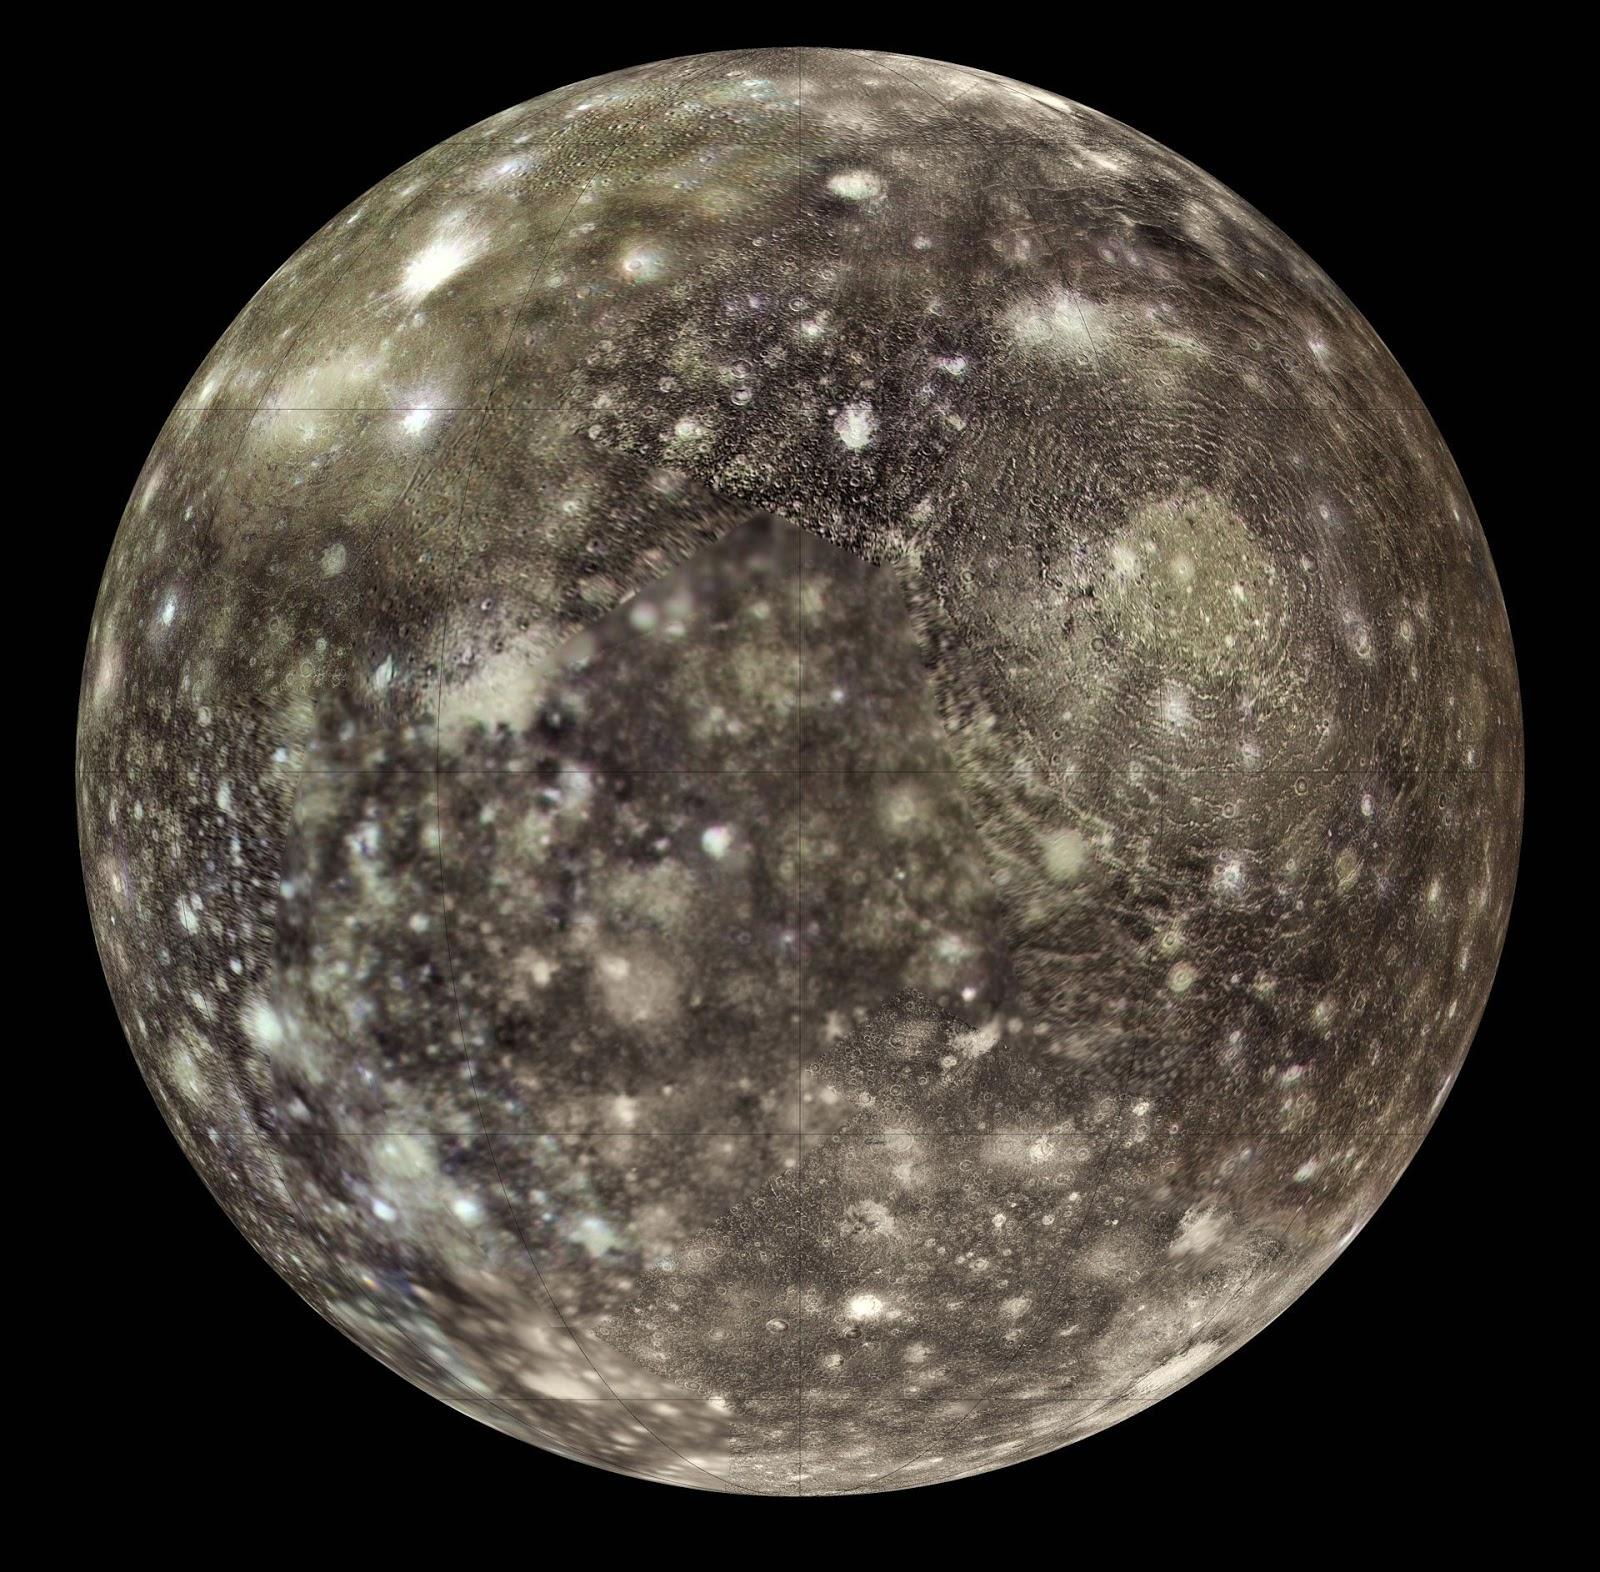 nasa callisto moon - photo #6